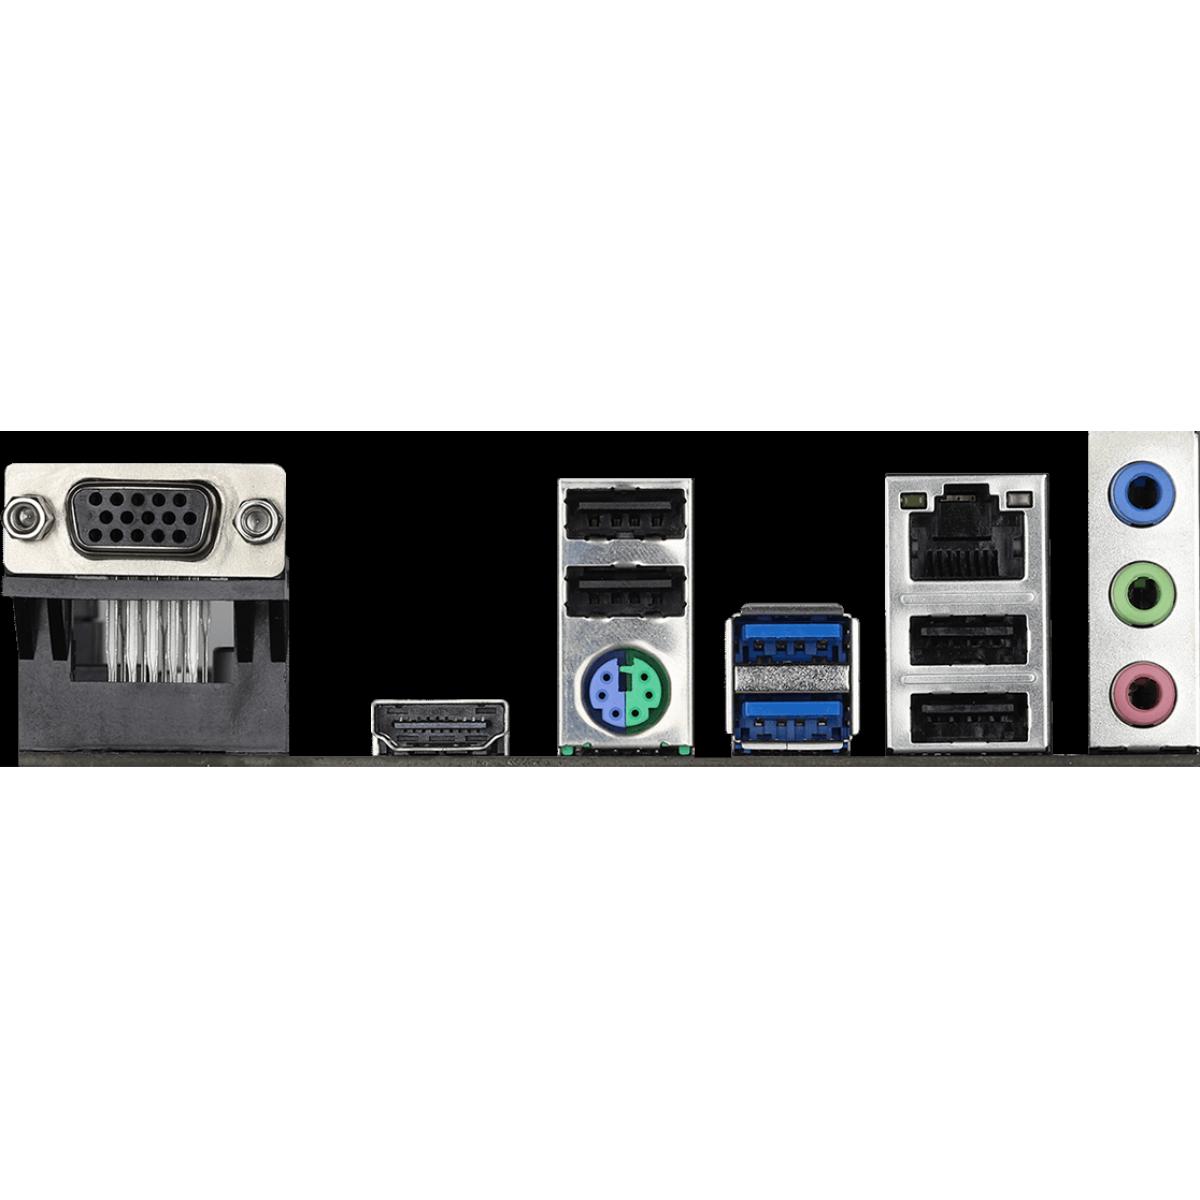 Placa Mãe Asrock H410M-HVS, Chipset H410M, Intel LGA 1200, mAXT, DDR4